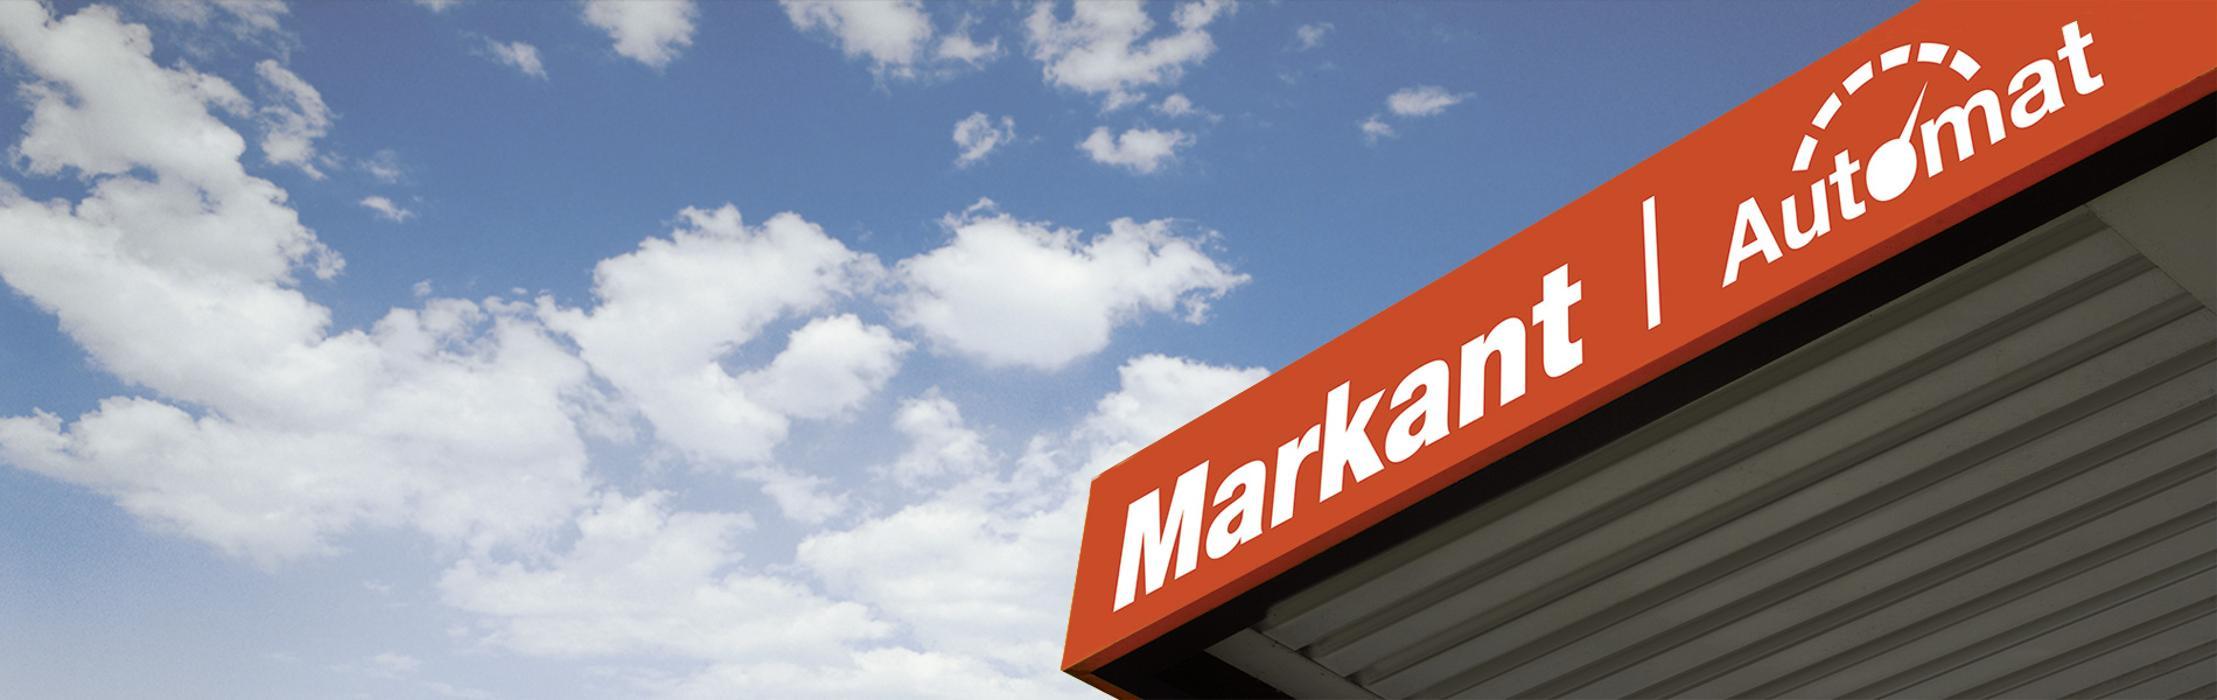 Bild der Markant Tankstelle - Marl, Bachackerweg 1